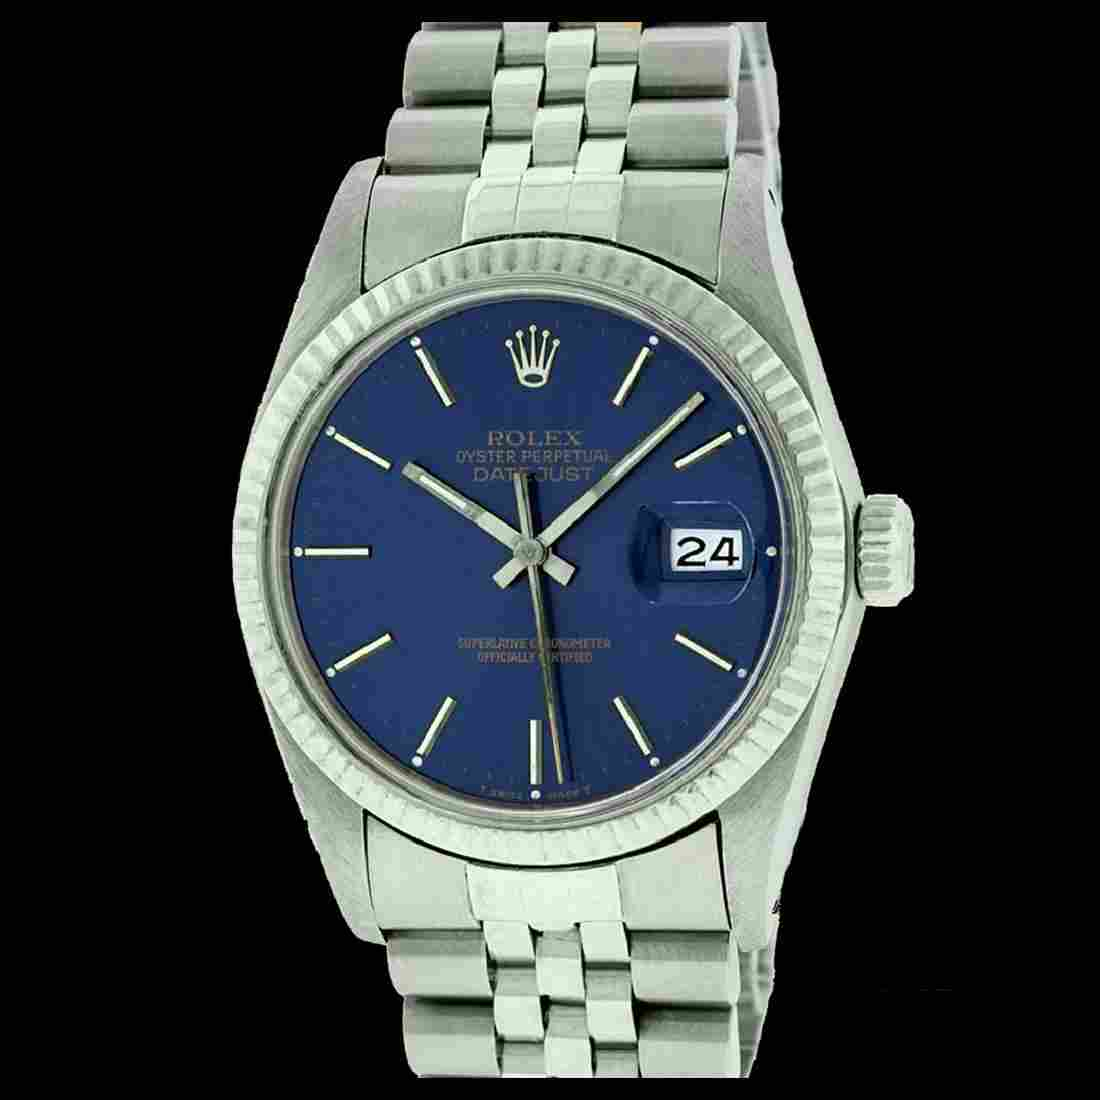 Rolex Men's Stainless Steel, QuickSet, Index Bar Dial,